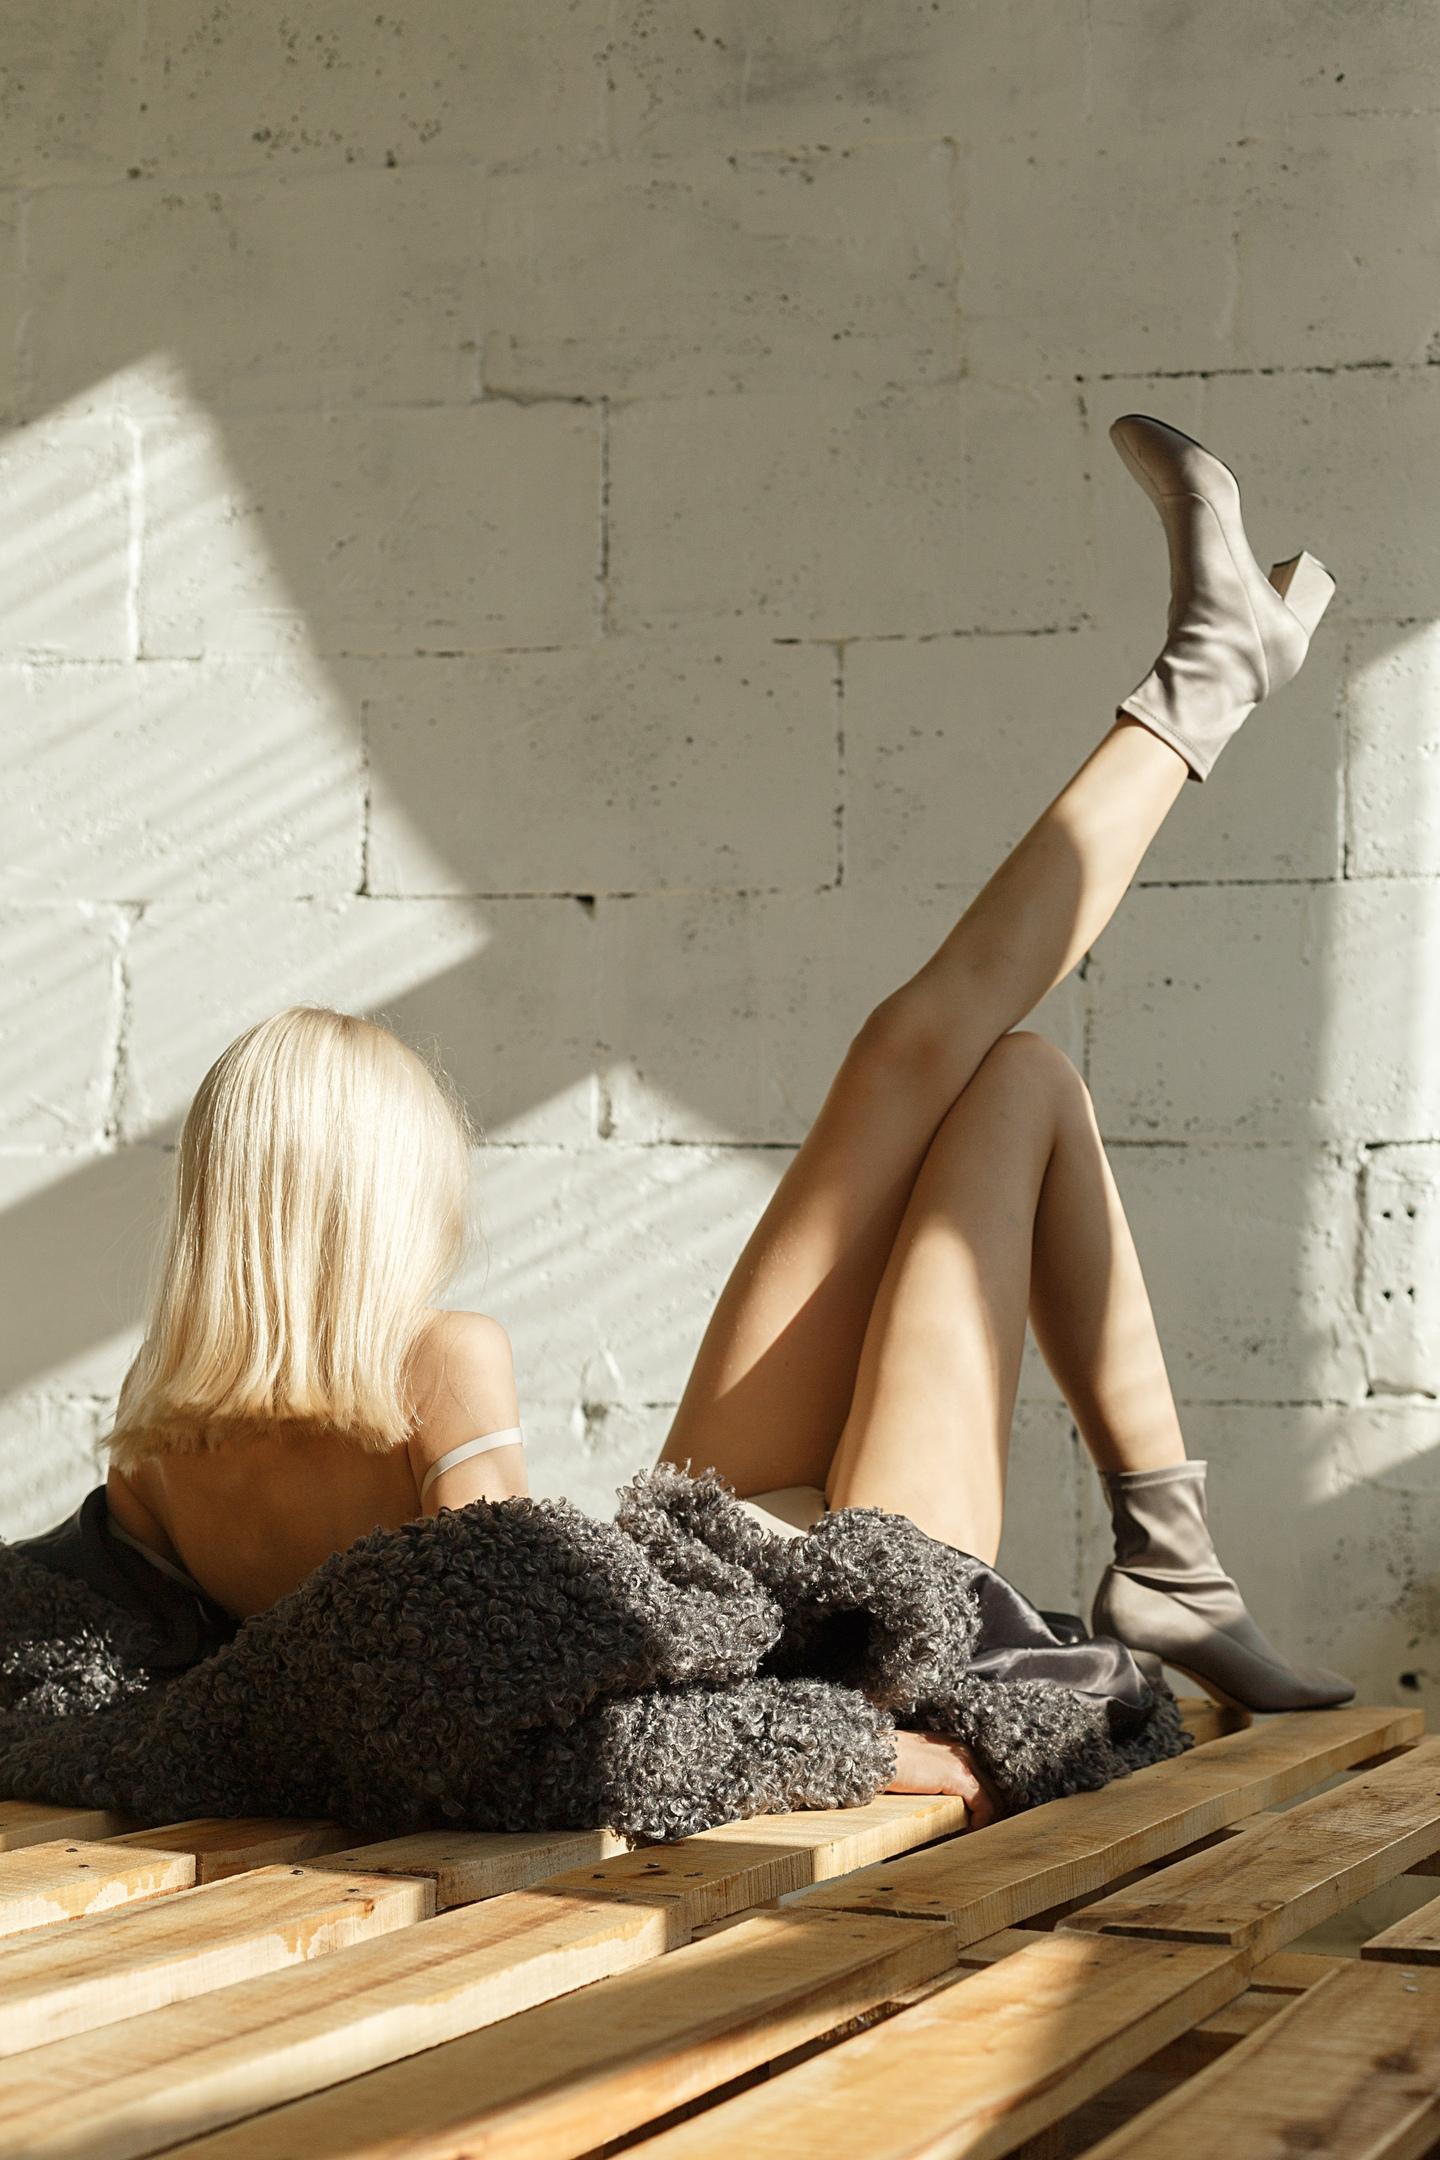 https://youngfolks.ru/pub/model-saule-khaliullina-model-angelina-andrianova